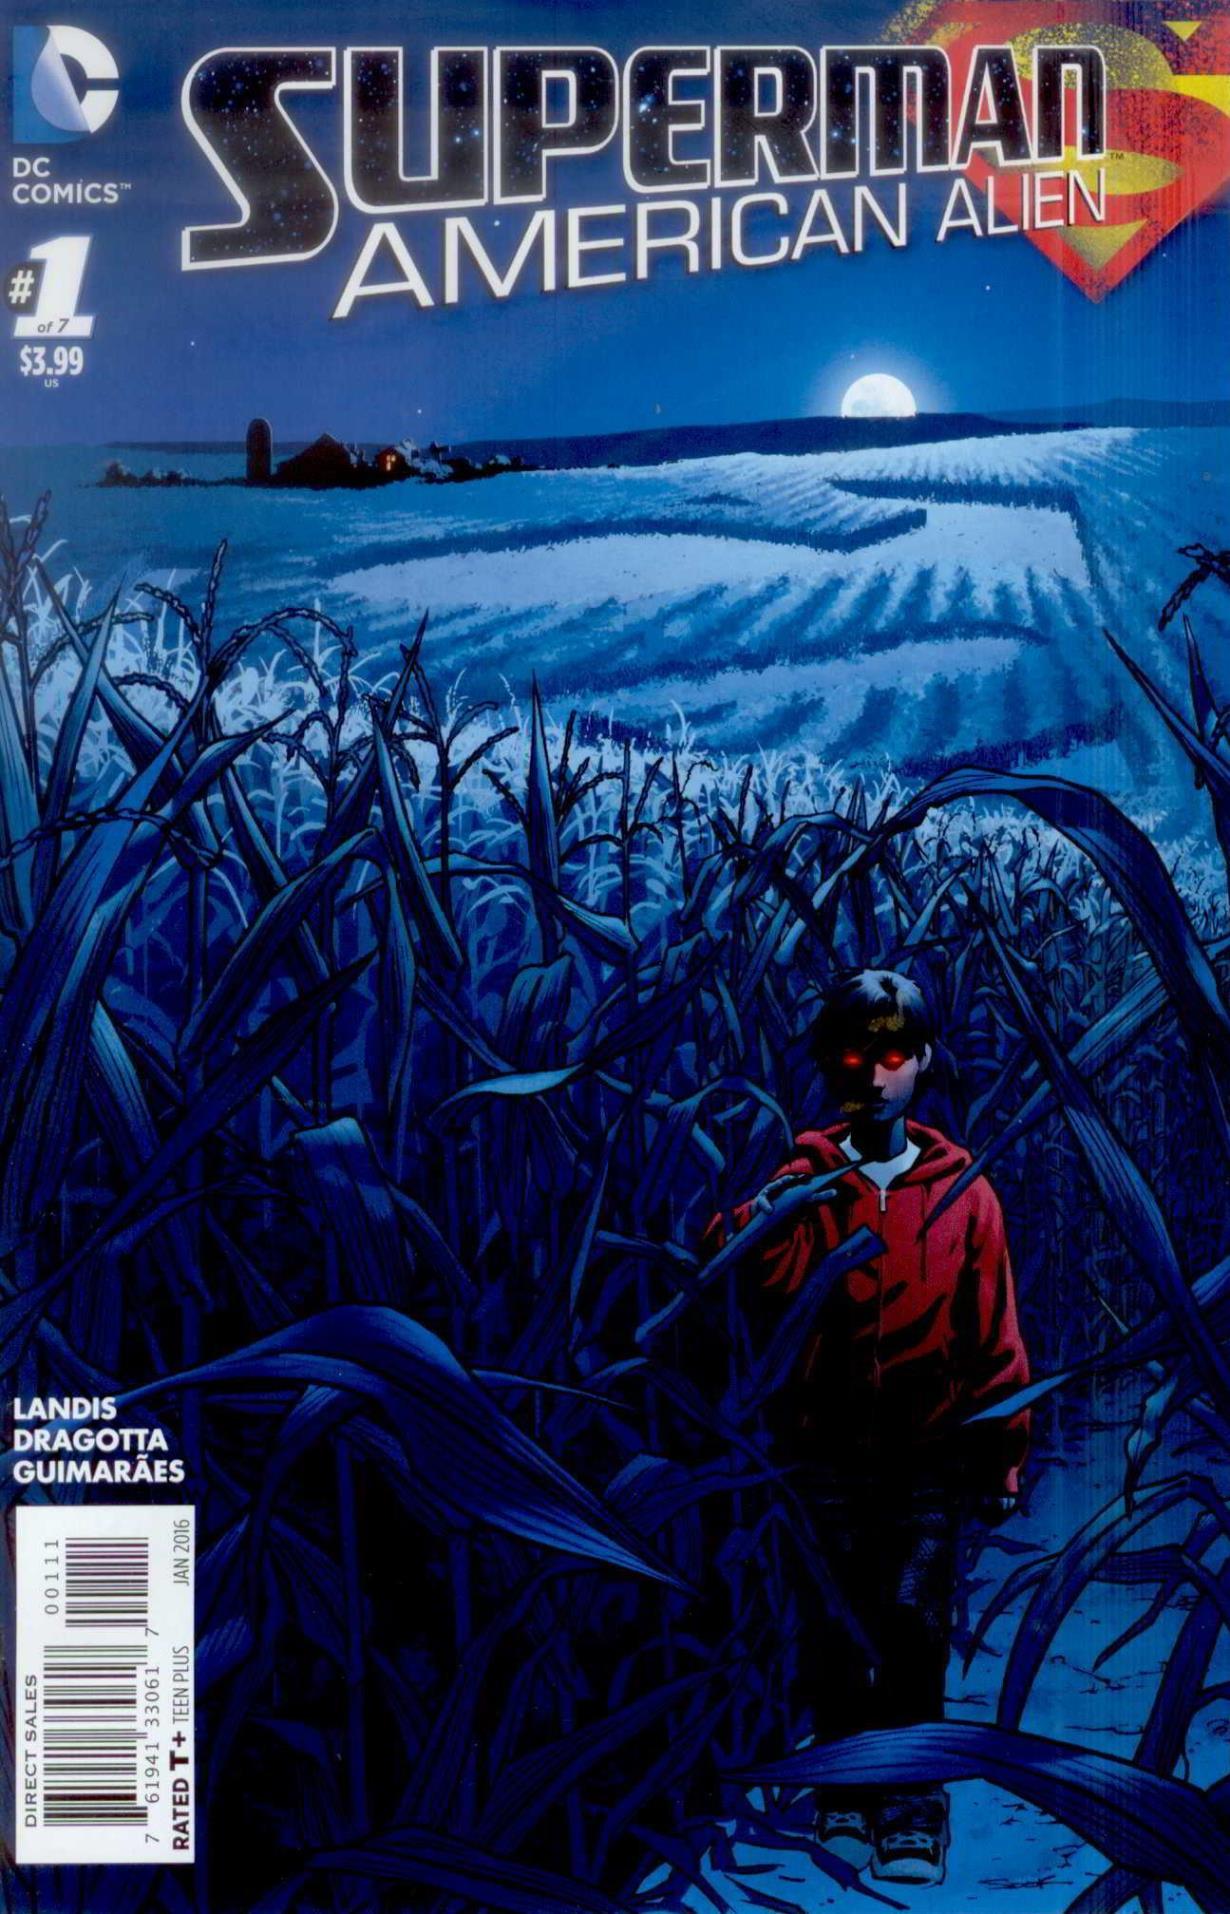 superman-american-alien-comics-volume-1-issues-v1-2015-ongoing-240373